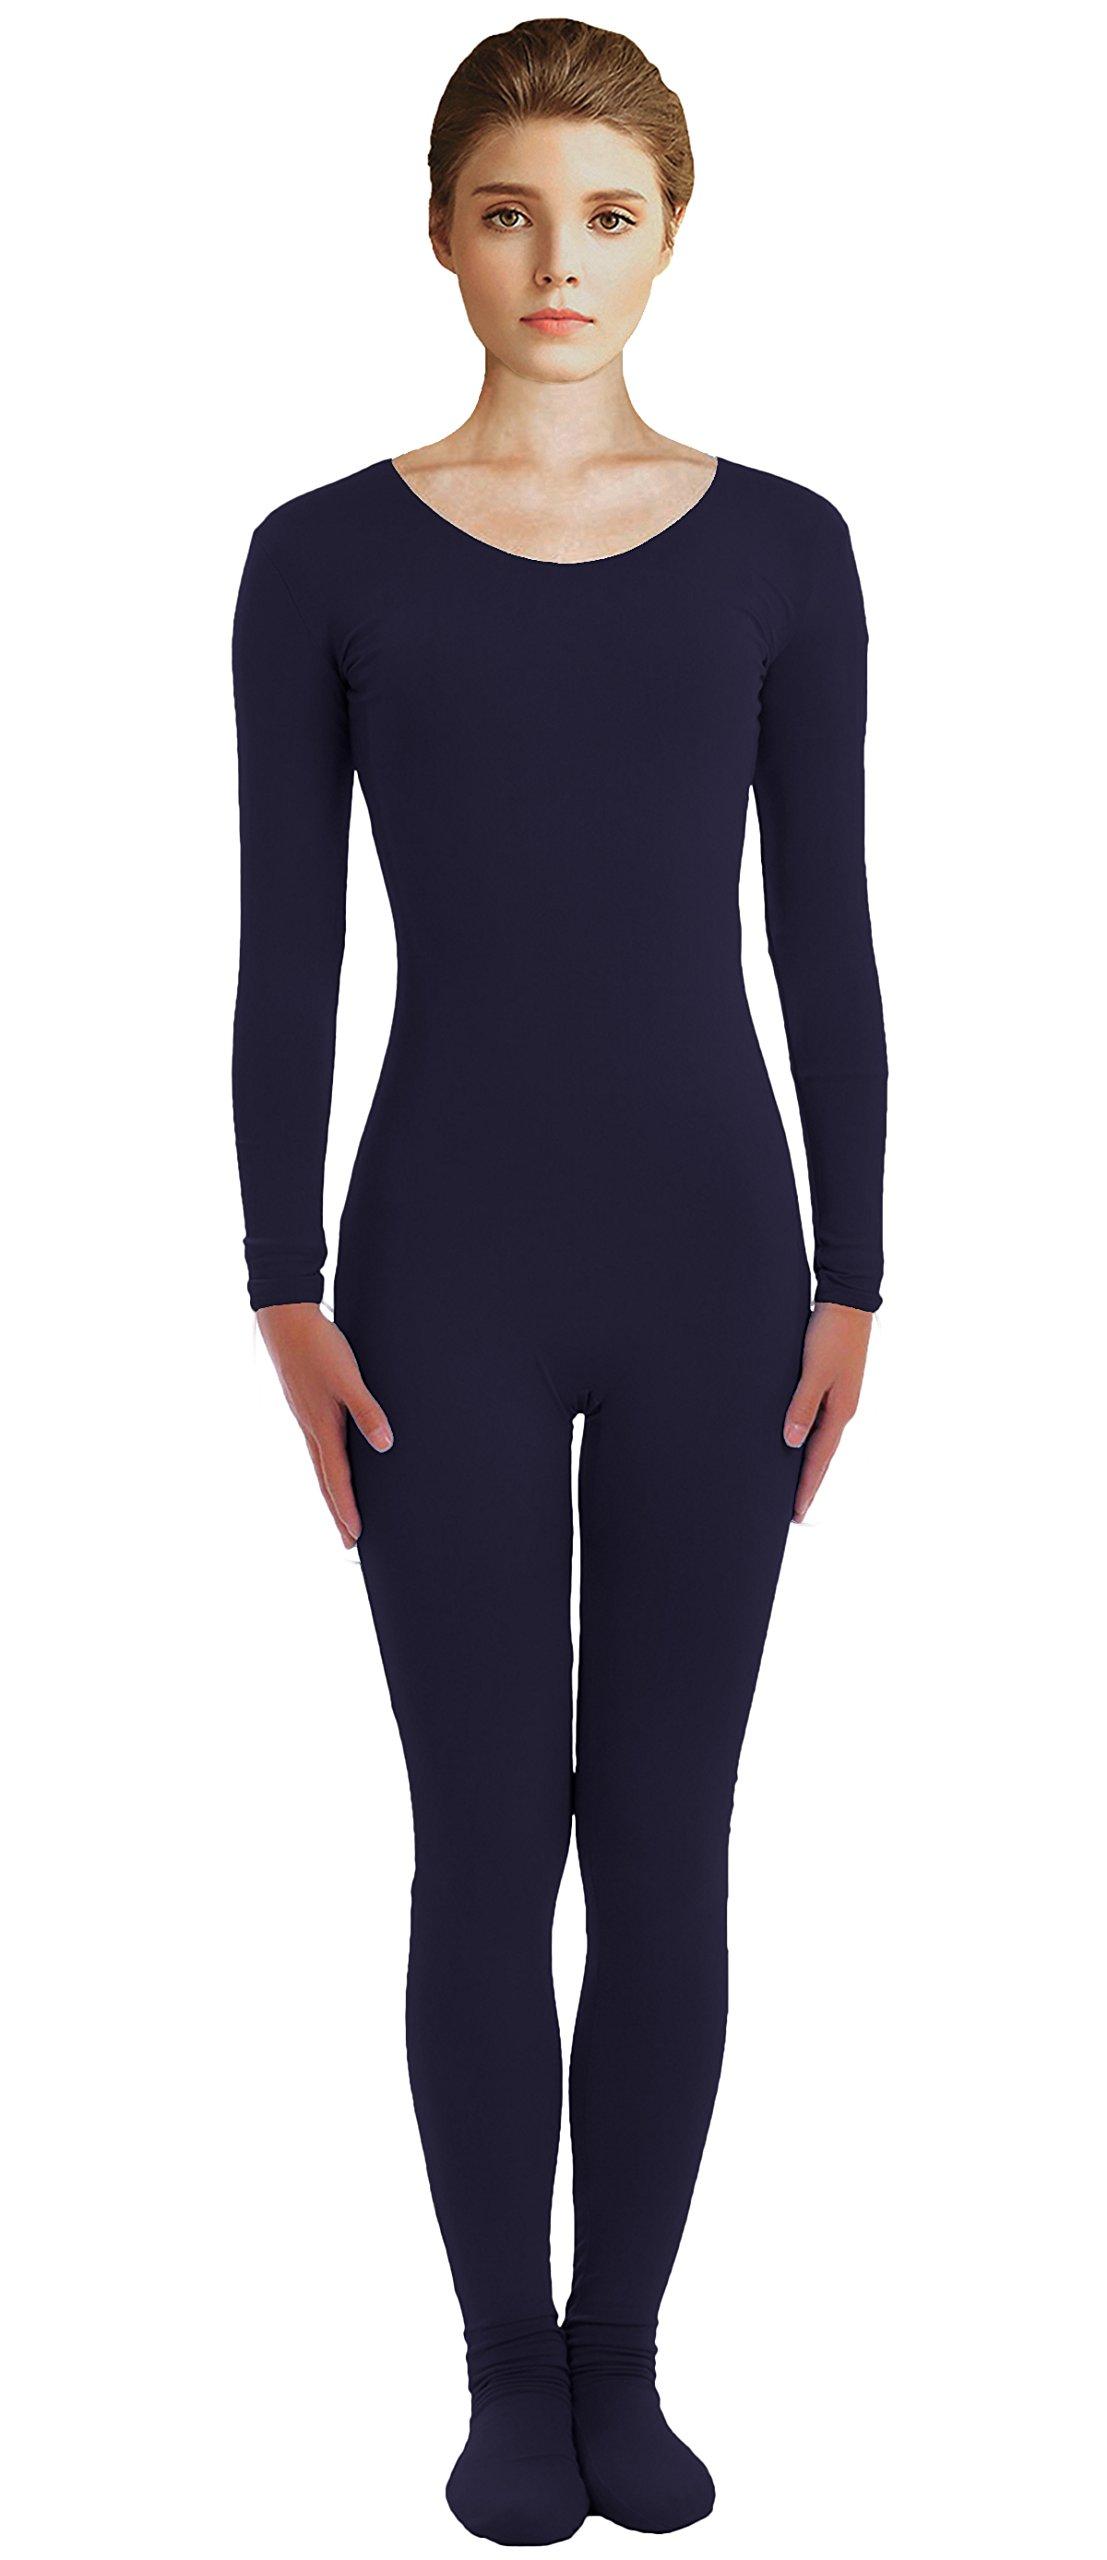 VSVO Adult Navy Scoop Neckline Unitard with Socks Catsuit Dancewear (XX-Large, Navy) by VSVO